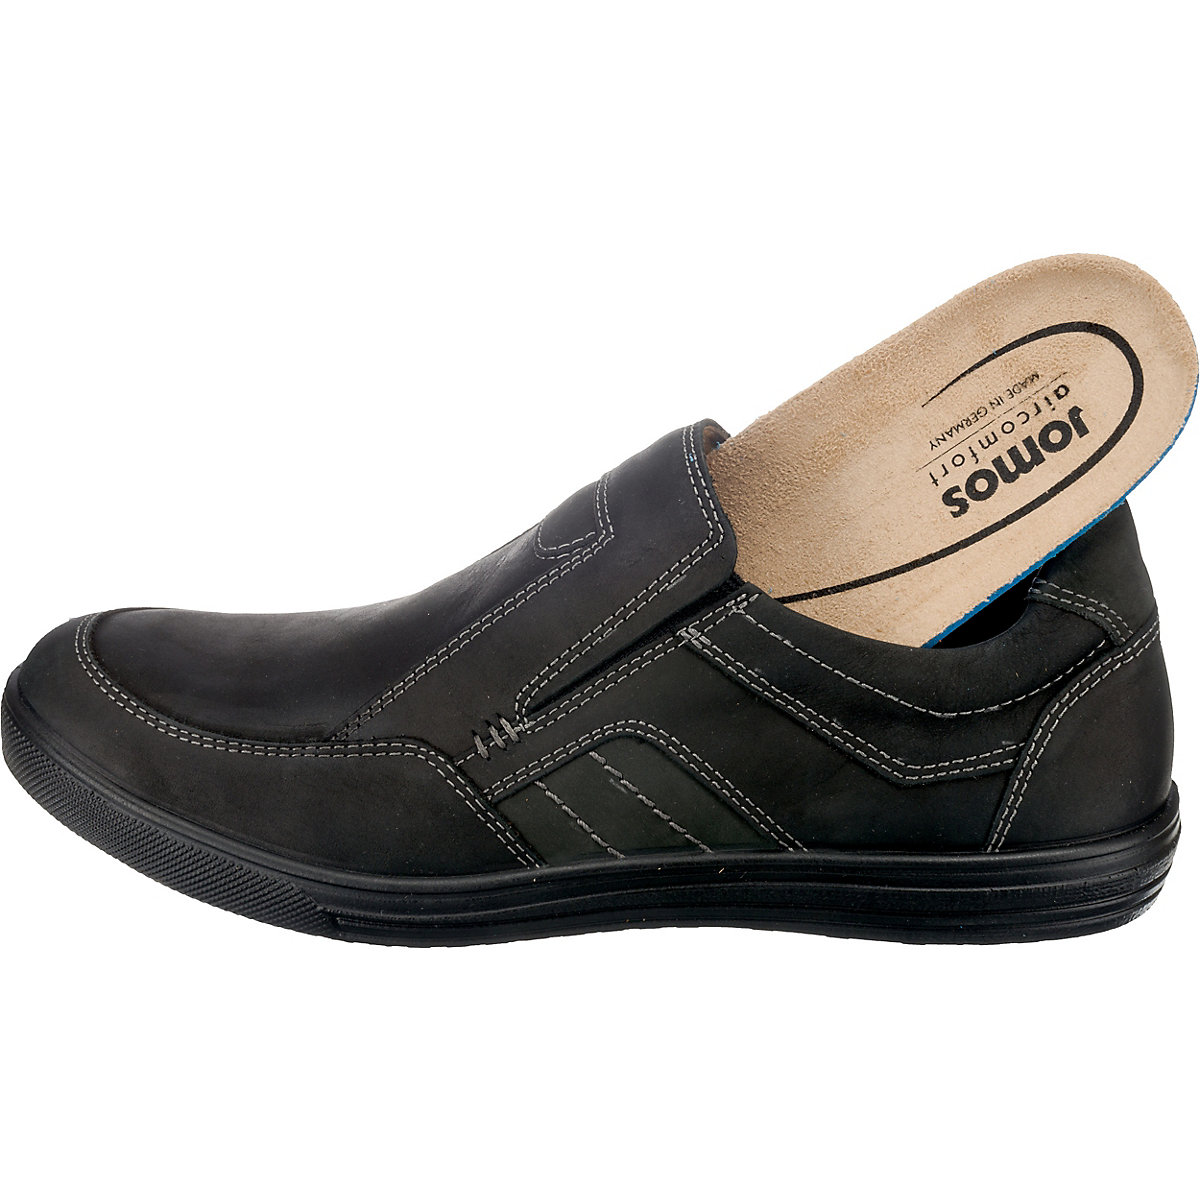 Jomos, Ariva Komfort-slipper Made In Germany, Schwarz